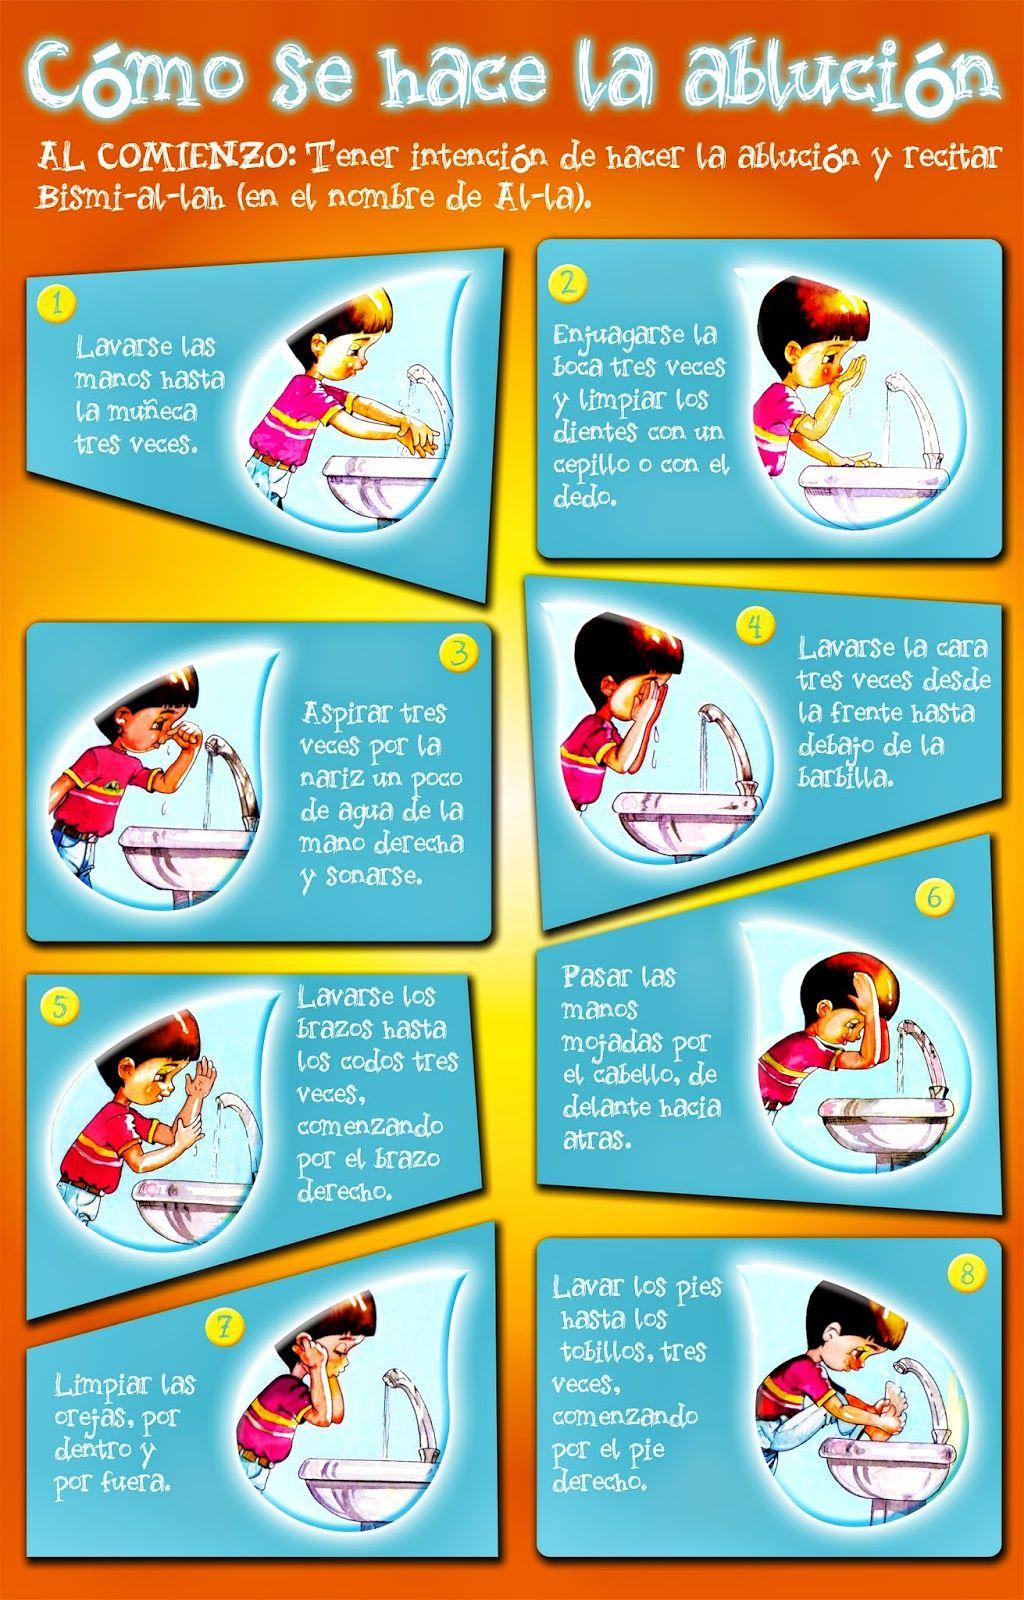 Pin By Mohamed Fathalla On استعداد الصلاة Muslim Kids Activities Muslim Kids Prayers